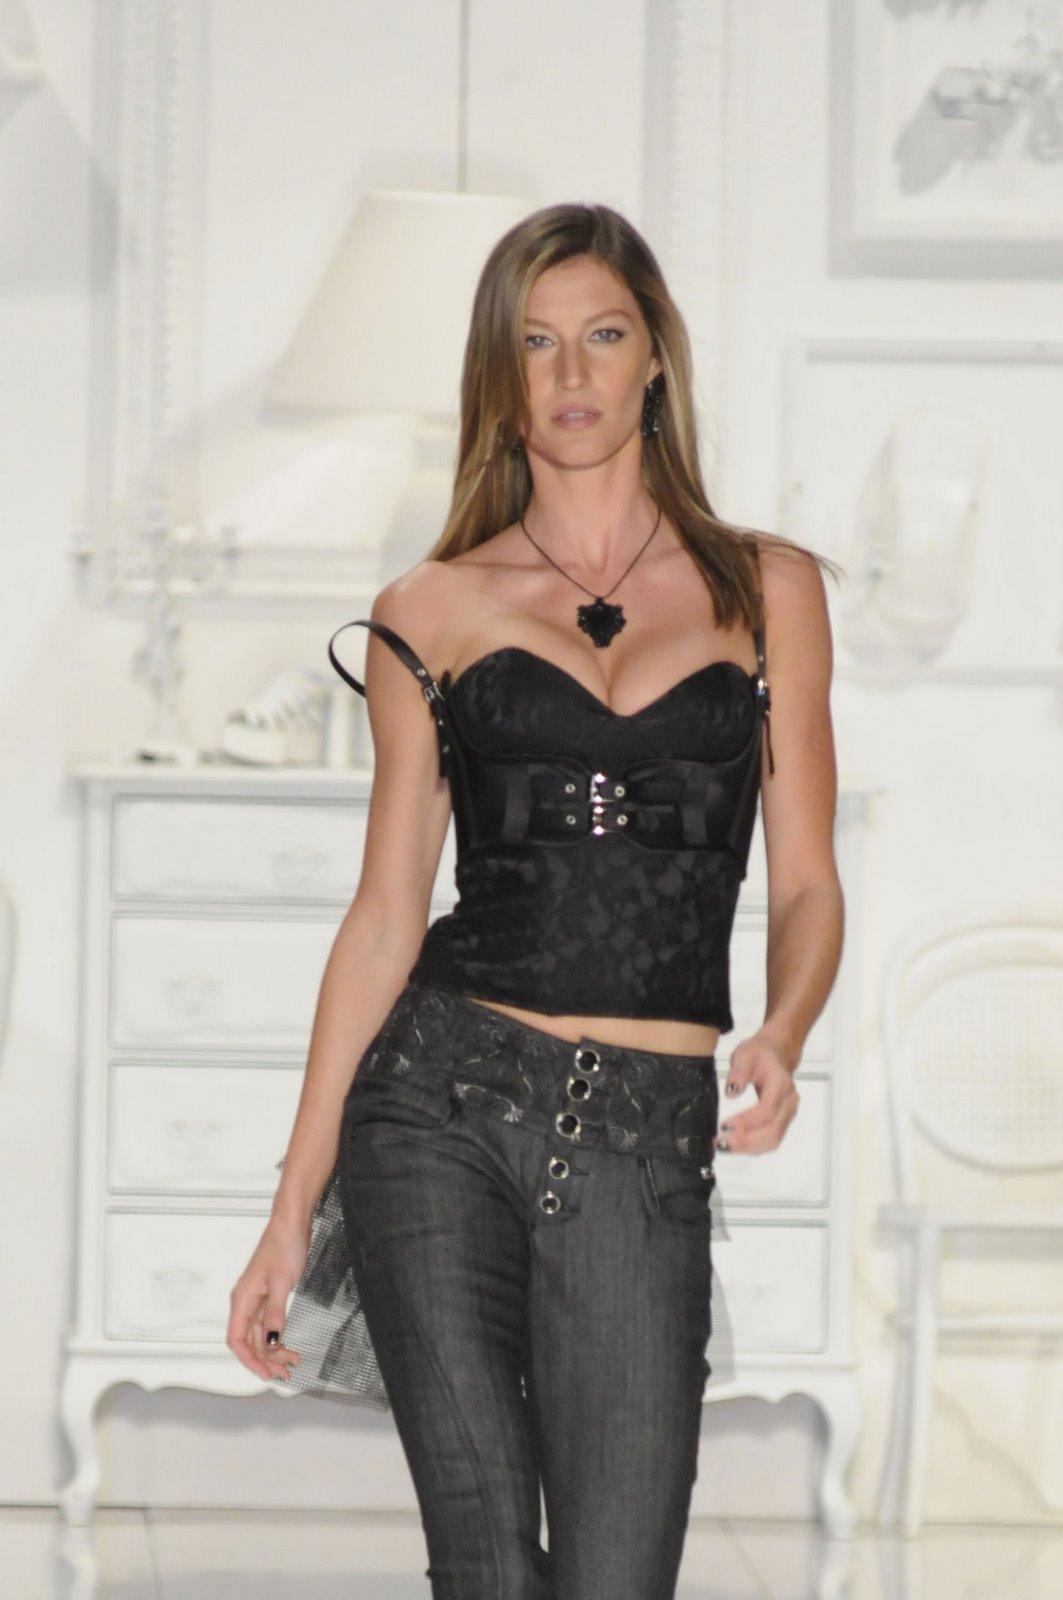 http://3.bp.blogspot.com/_ENbitNsm7RI/SXn4GcY-dKI/AAAAAAAAOrc/axojv0cUXYI/s1600/Gisele_Bundchen_-_Sao_Paulo_Fashion_Week-6_122%28hotcelebshome%29.jpg